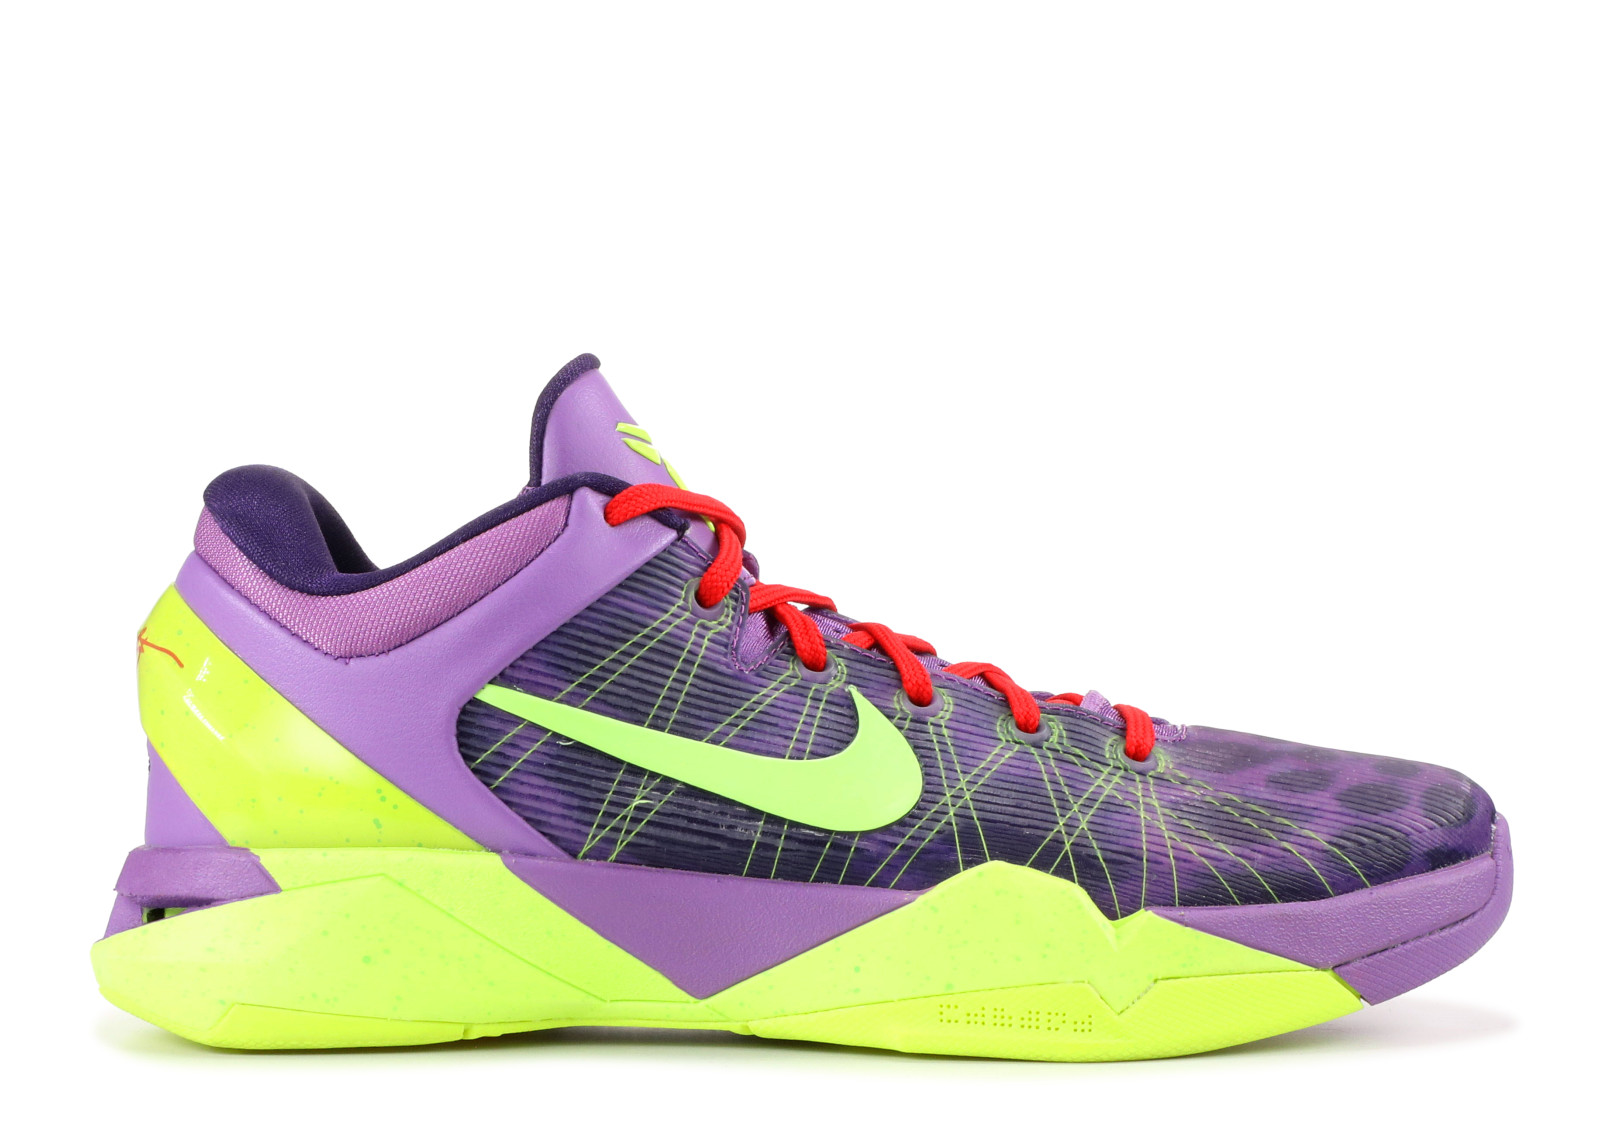 What Pros Wear: Kobe Bryant's Nike Zoom Kobe 7 Shoes - What Pros Wear